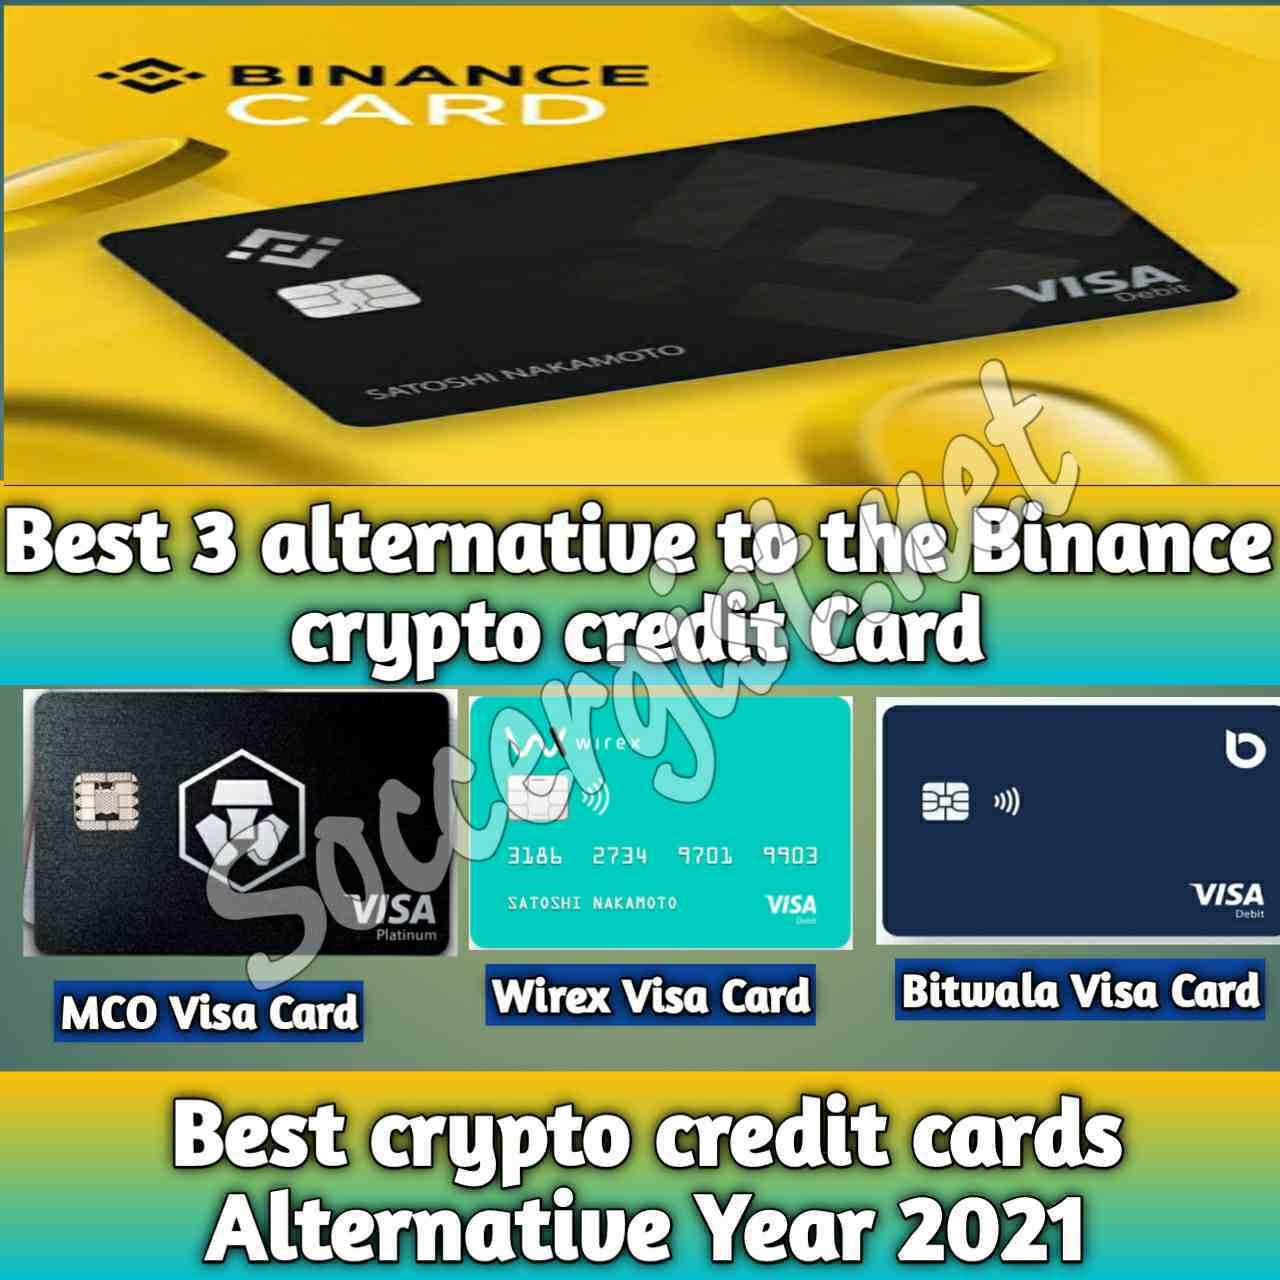 best-crypto-credit-cards-alternative-to-binance